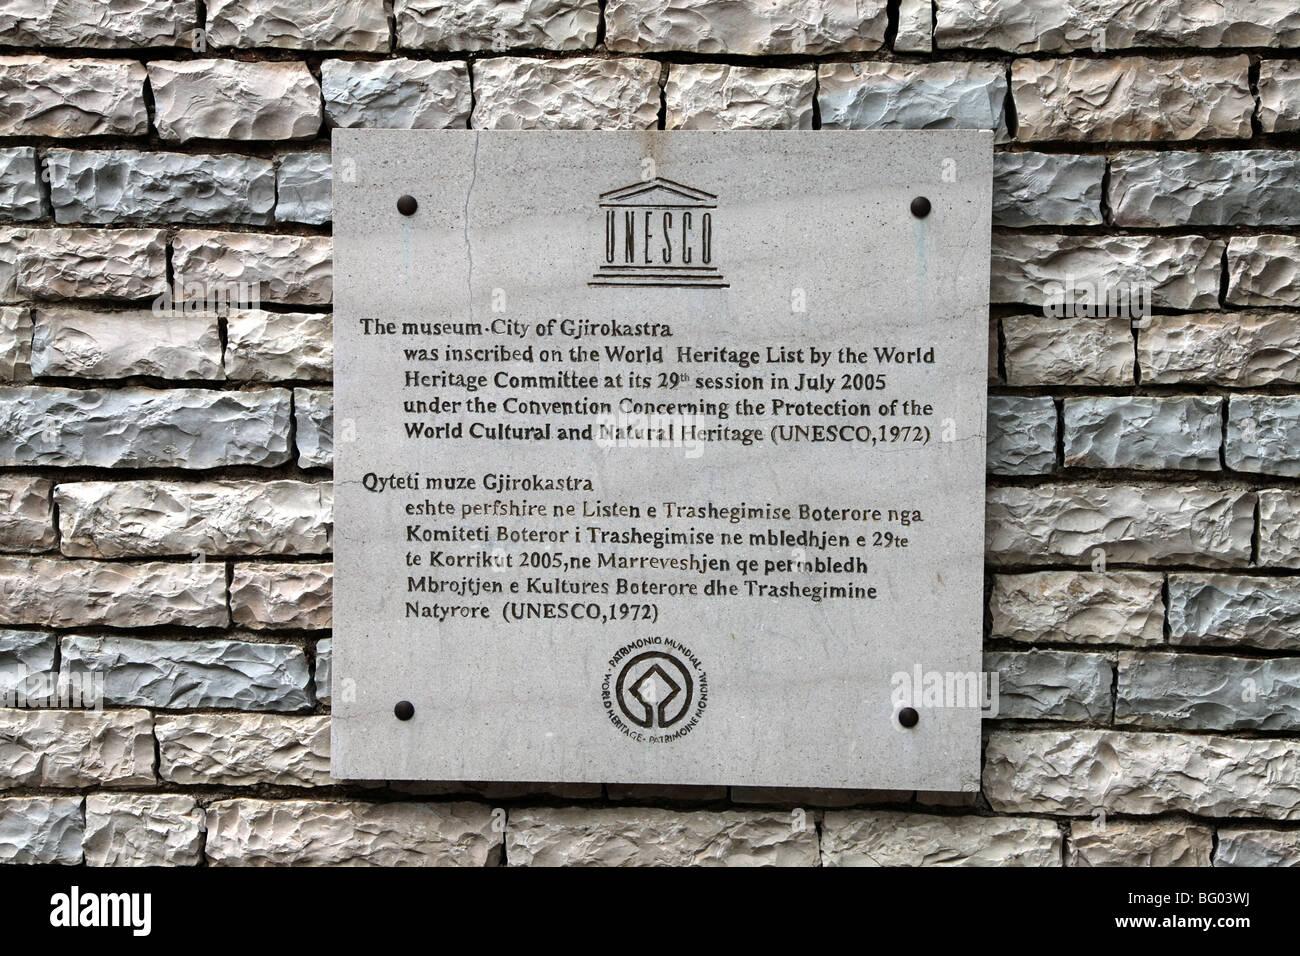 UNESCO World Heritage Site plaque on stone wall in old city of Gjirokastra, Albania - Stock Image